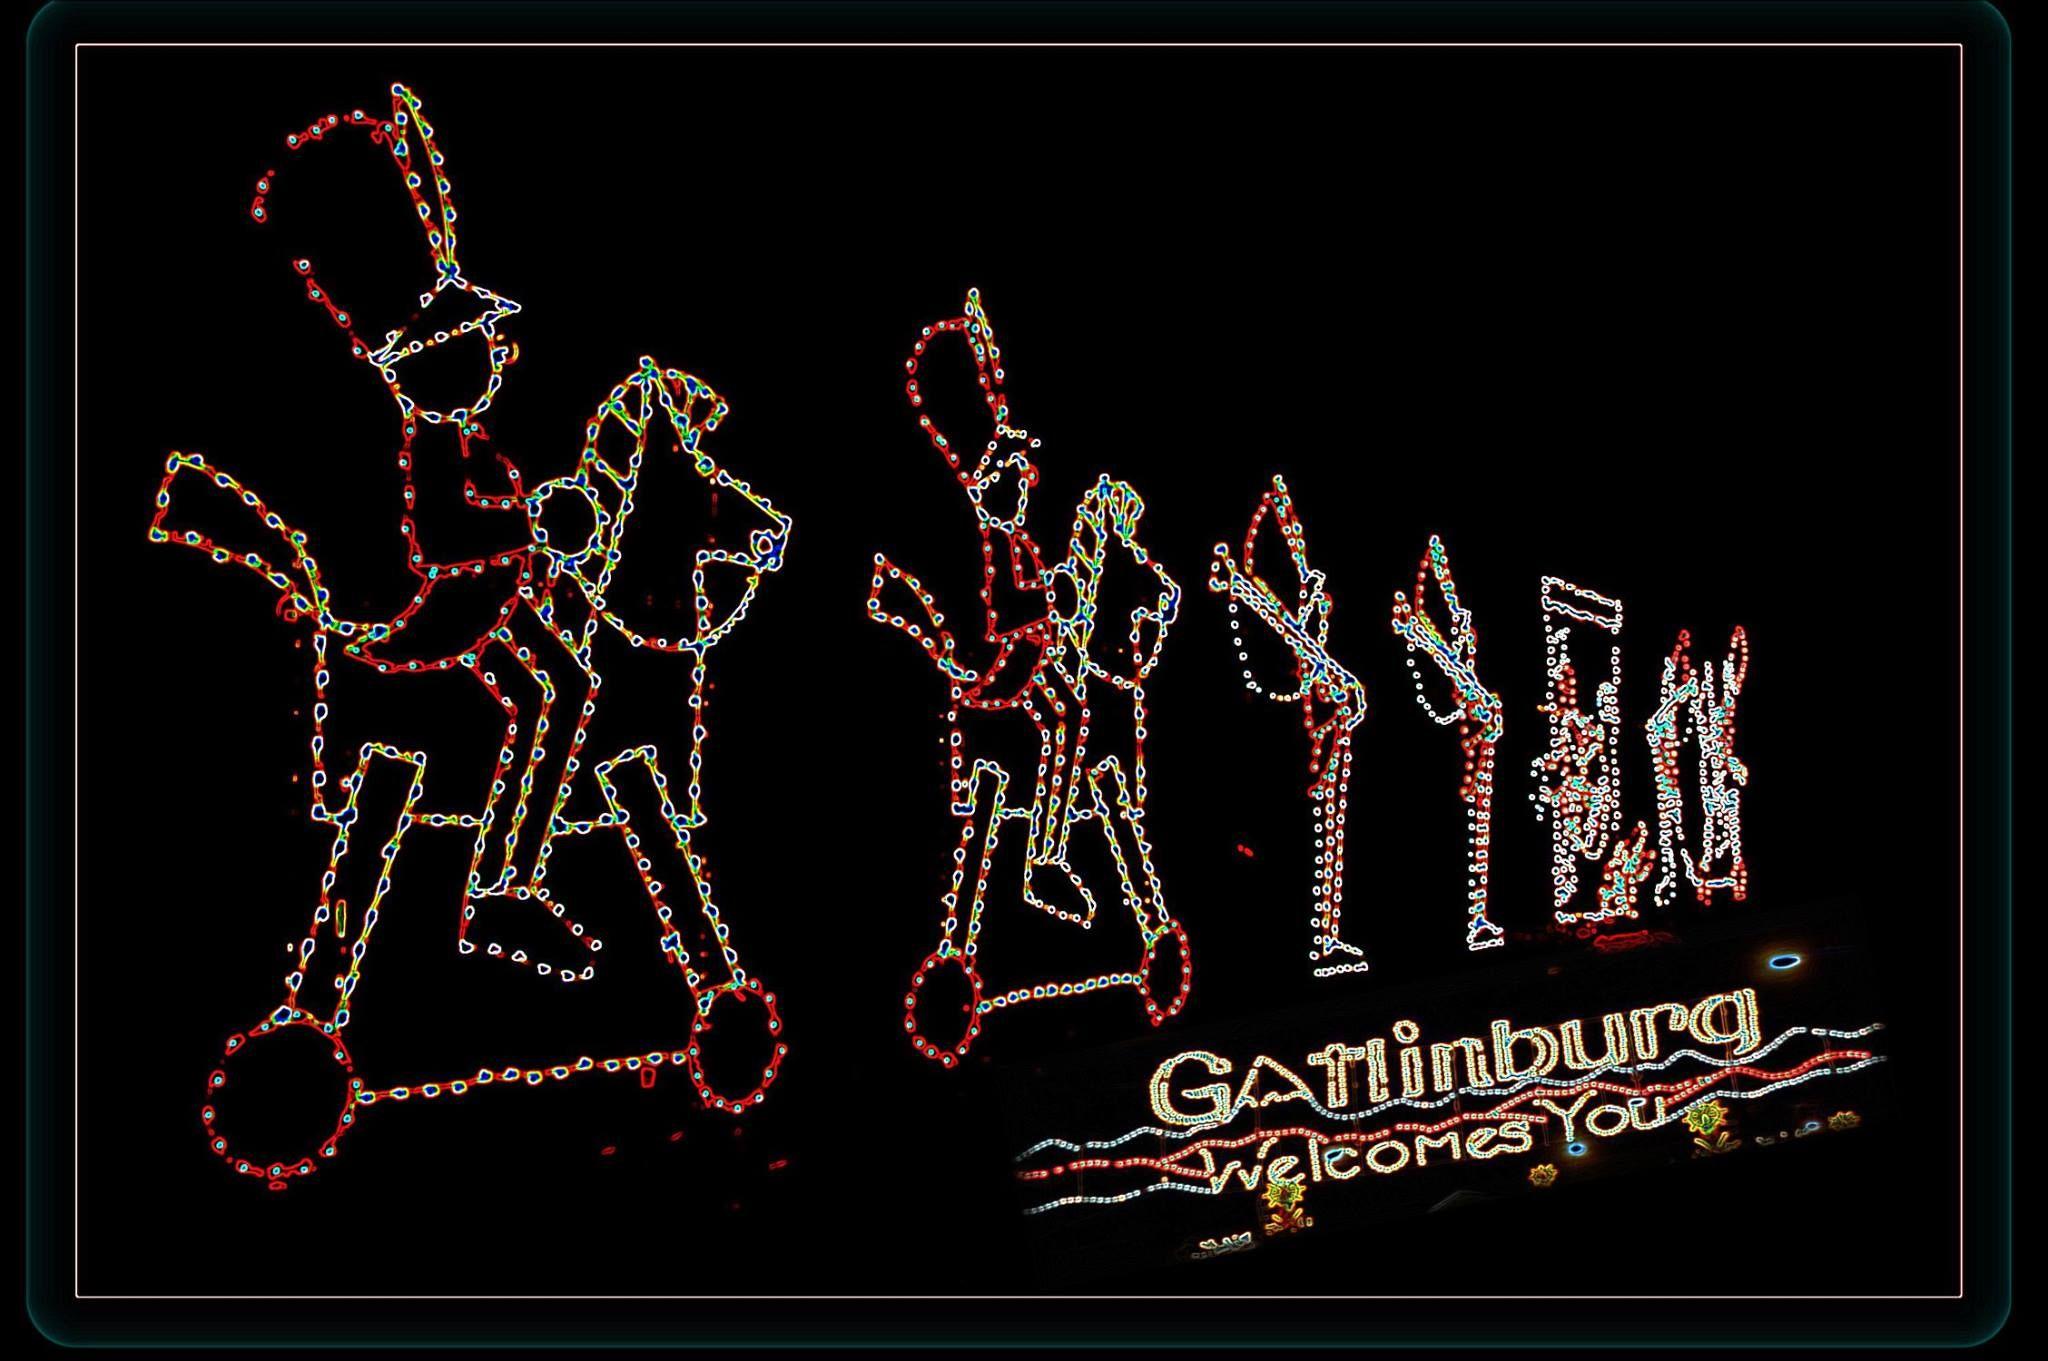 December And Gatlinburg Winter Magic Go Together